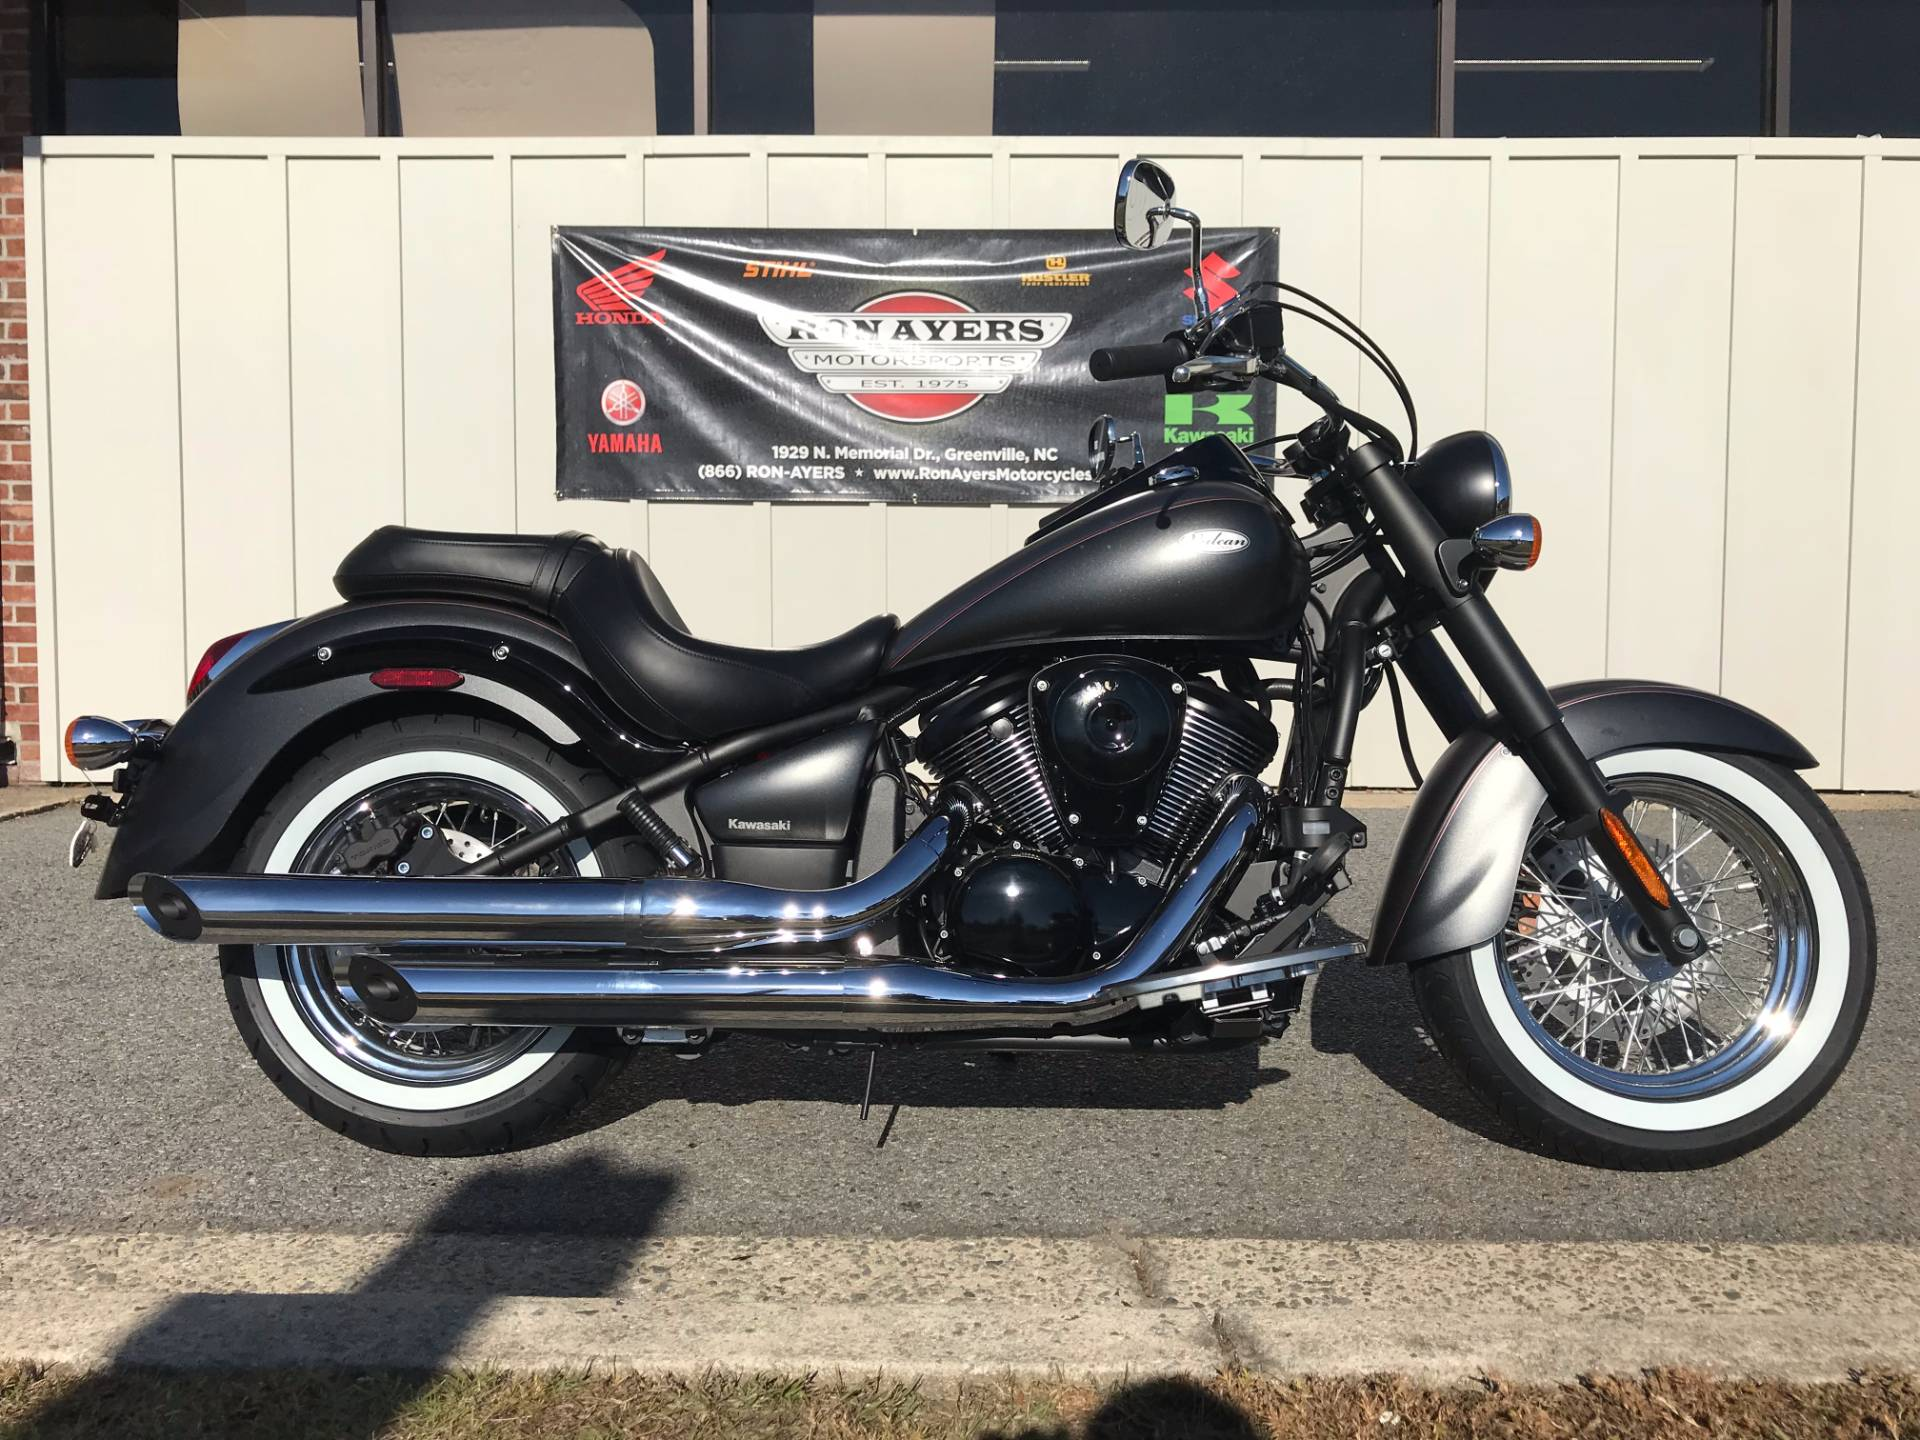 New 2018 Kawasaki Vulcan 900 Classic Motorcycles in Greenville NC